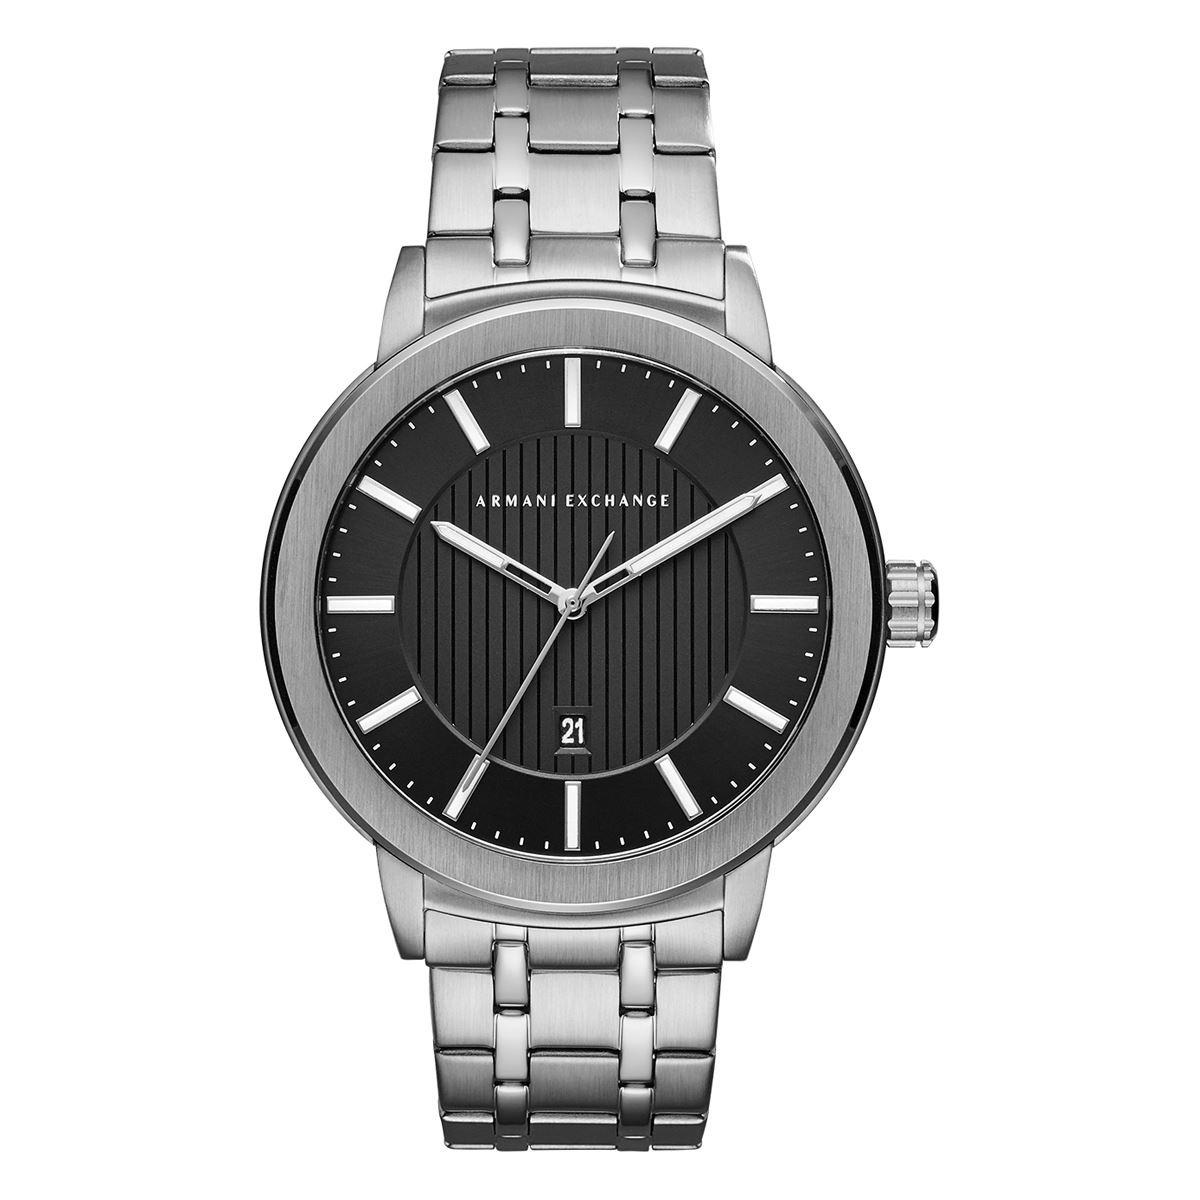 Reloj armani exchange ax1455  - Sanborns